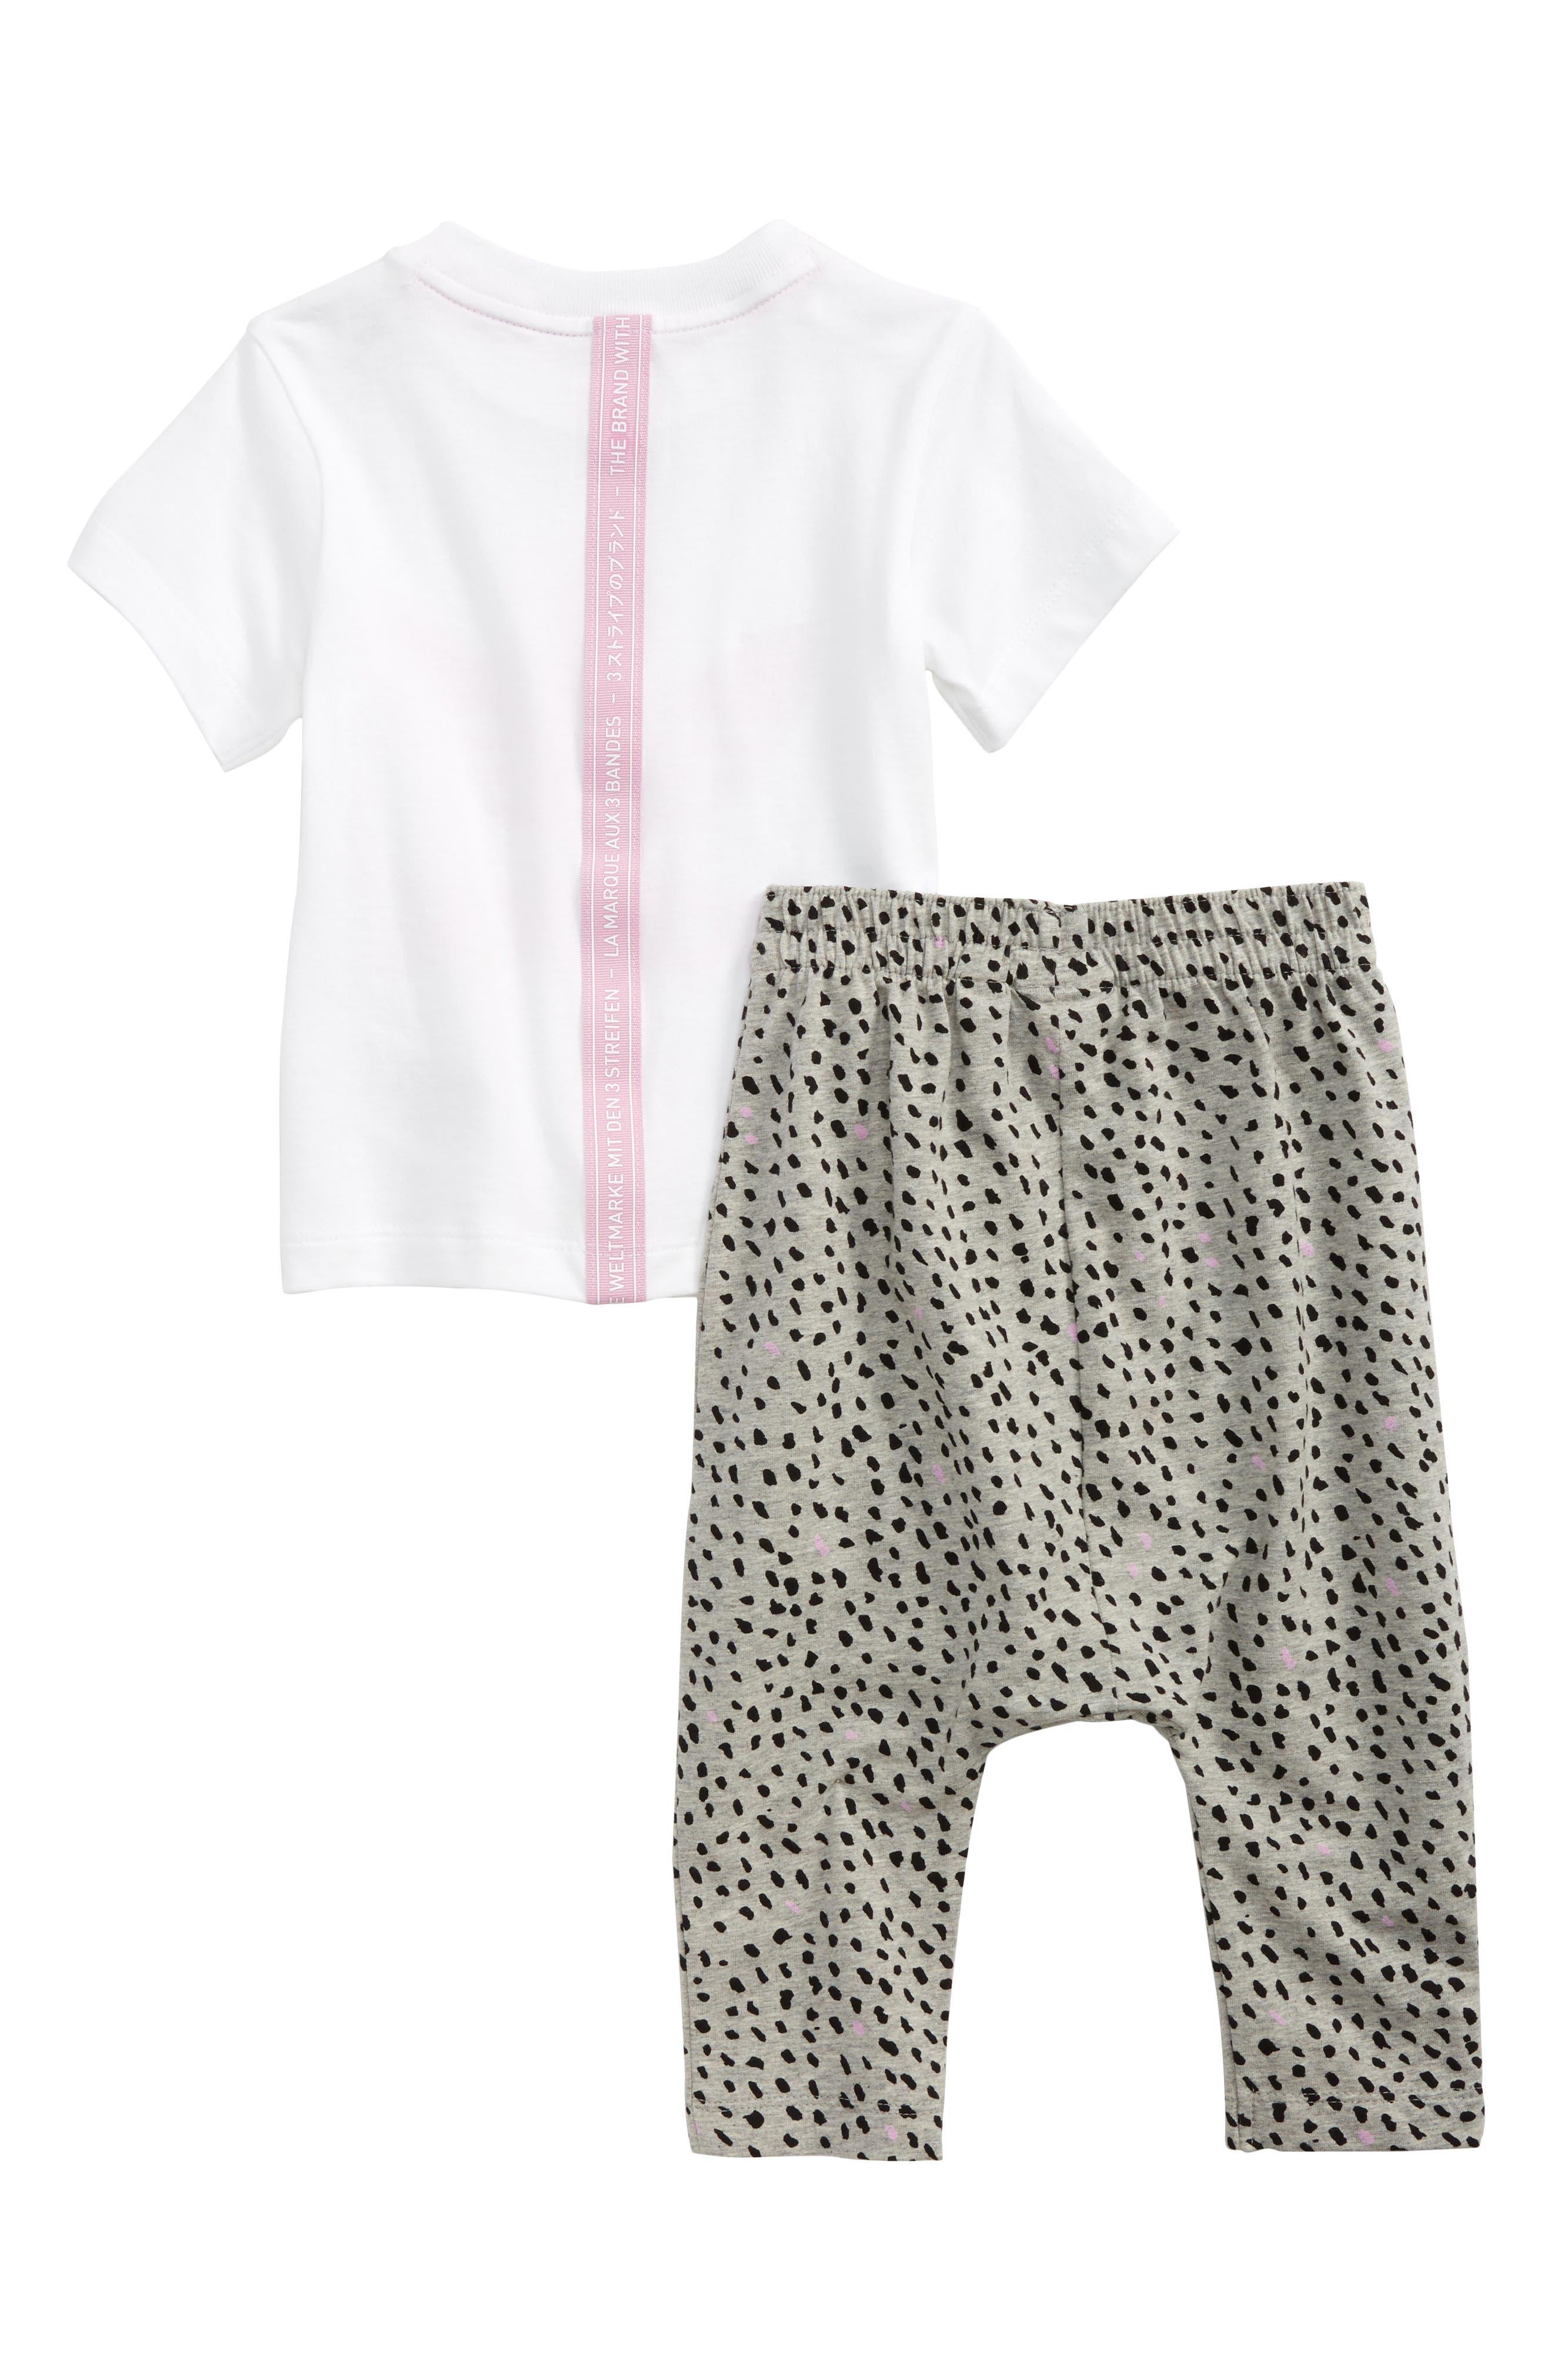 Alternate Image 2  - adidas Originals Logo Tee & Print Leggings Set (Baby Girls)